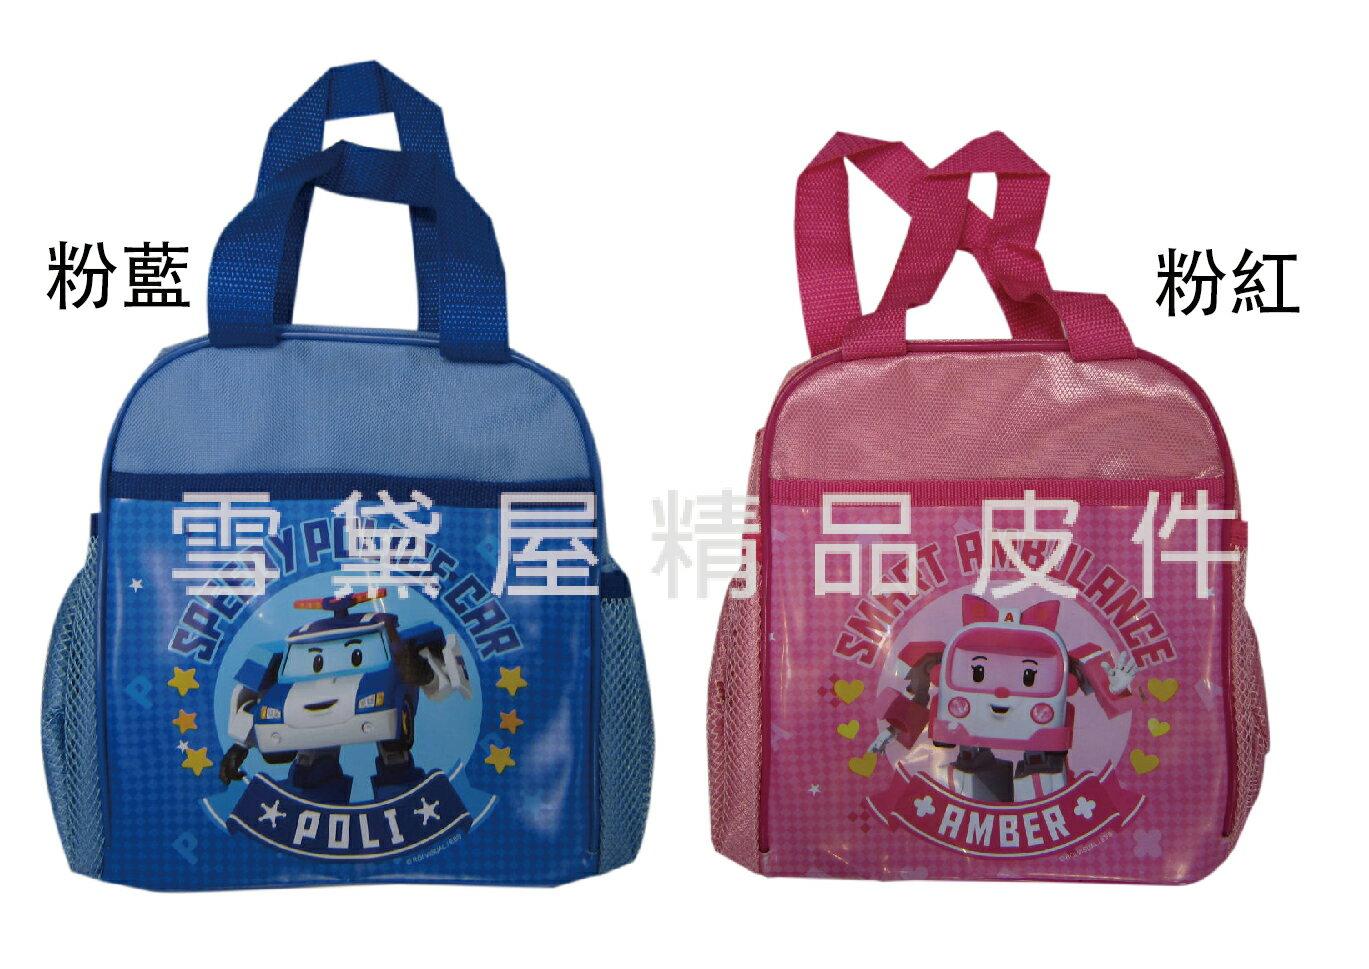 <br/><br/> ~雪黛屋~波力 餐袋便當袋正版授權公司貨商品防水尼龍布材質可放水瓶網袋國家安檢標準KFN3A34<br/><br/>